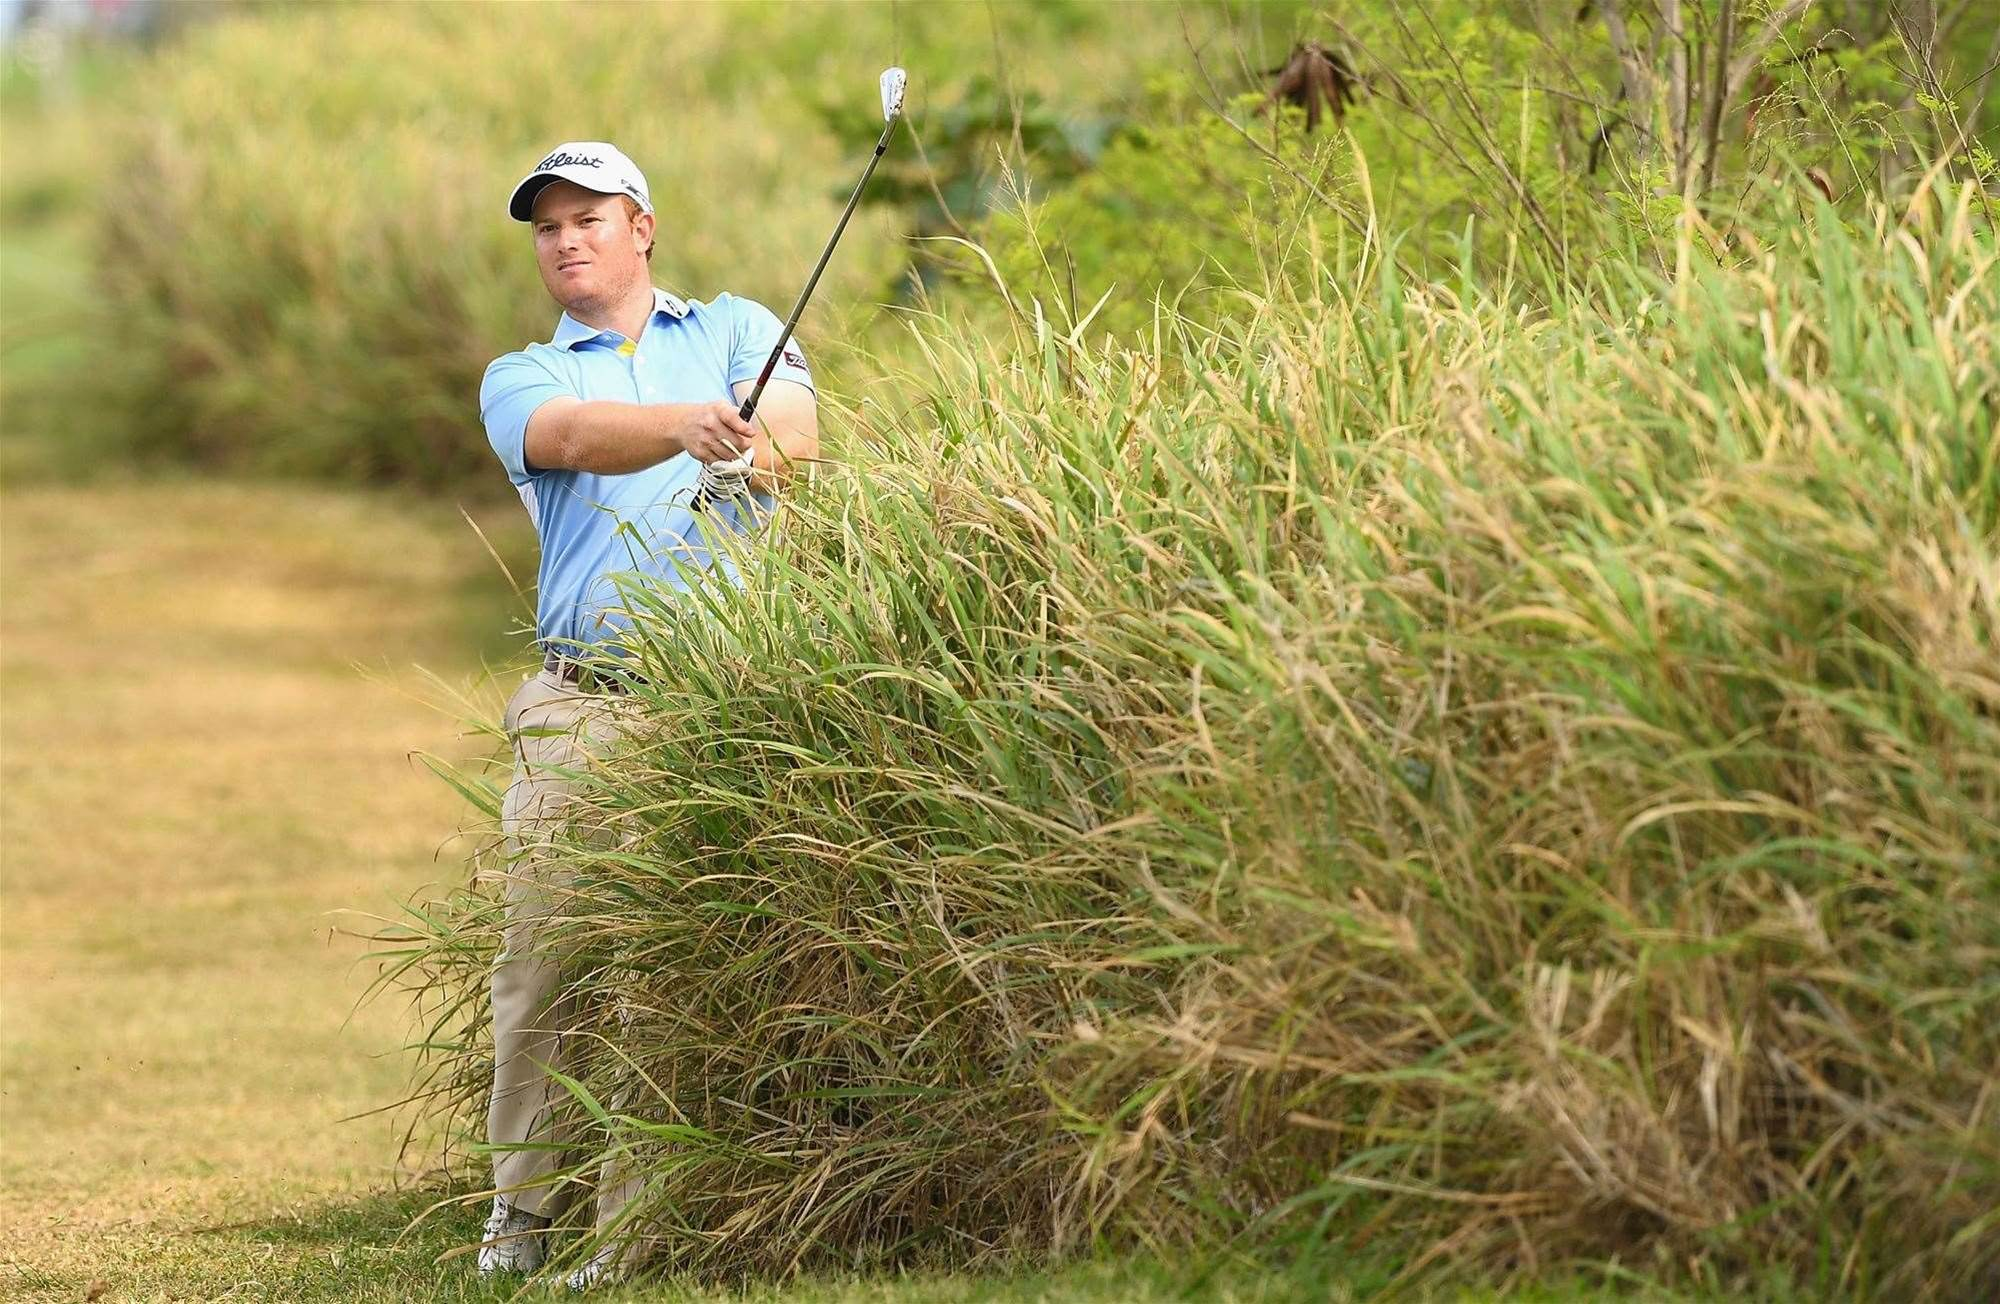 Fiji International: Giles faces career-altering weekend